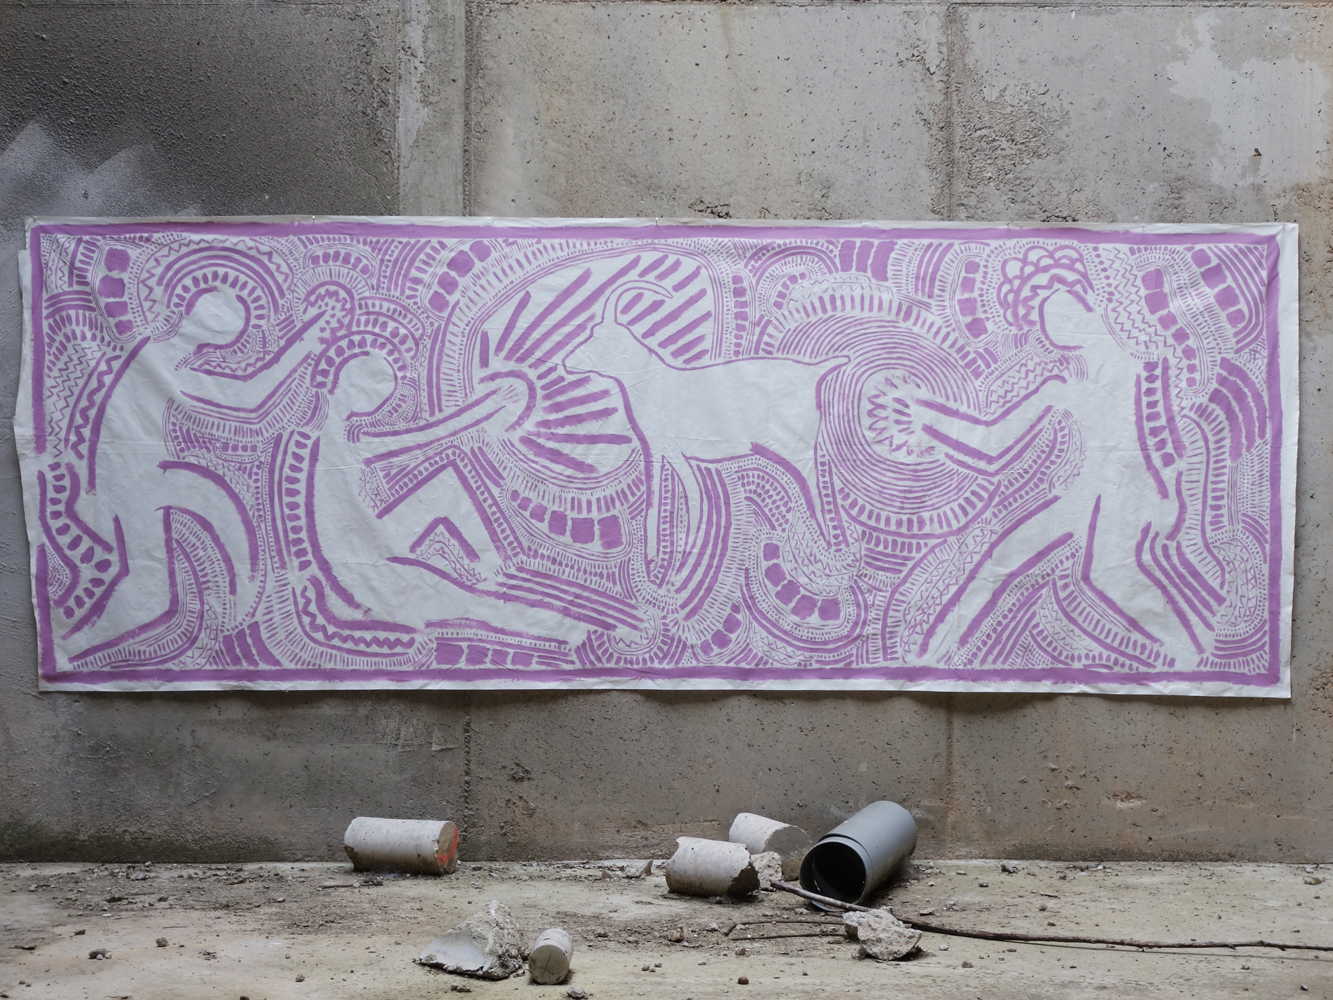 purple_pink_goat_abandoned_building_spain_2016_christopher_jewitt.jpg